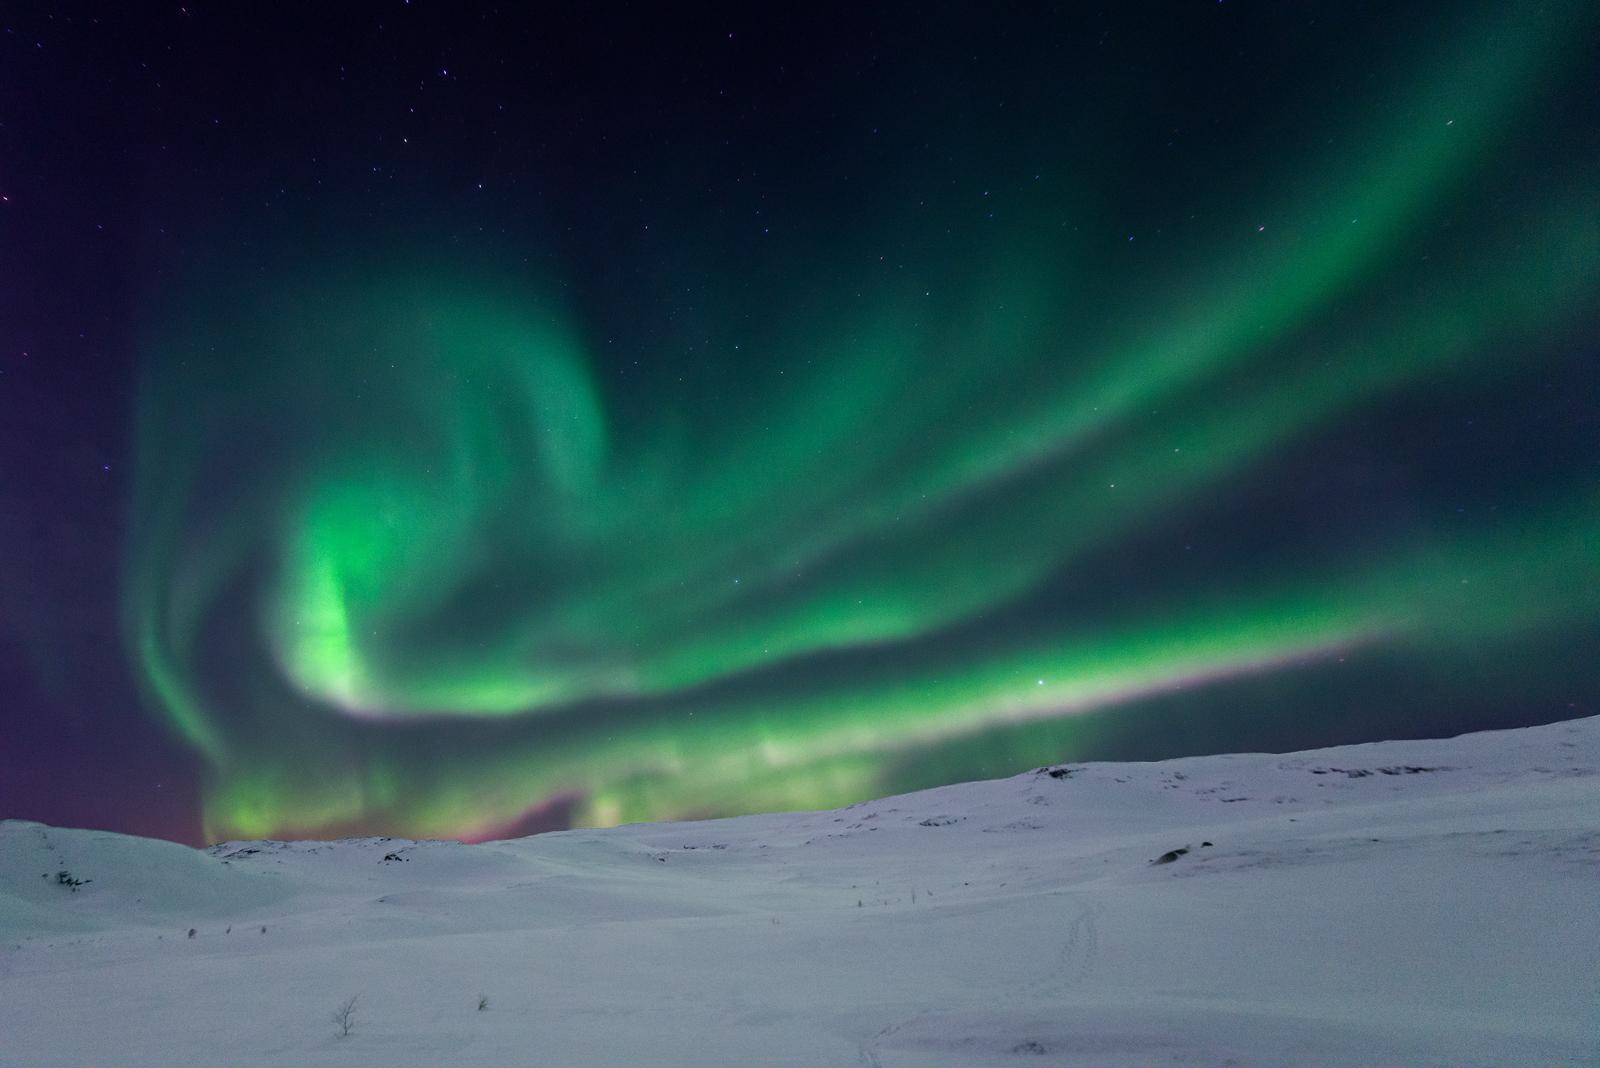 Swirling polar lights at night.